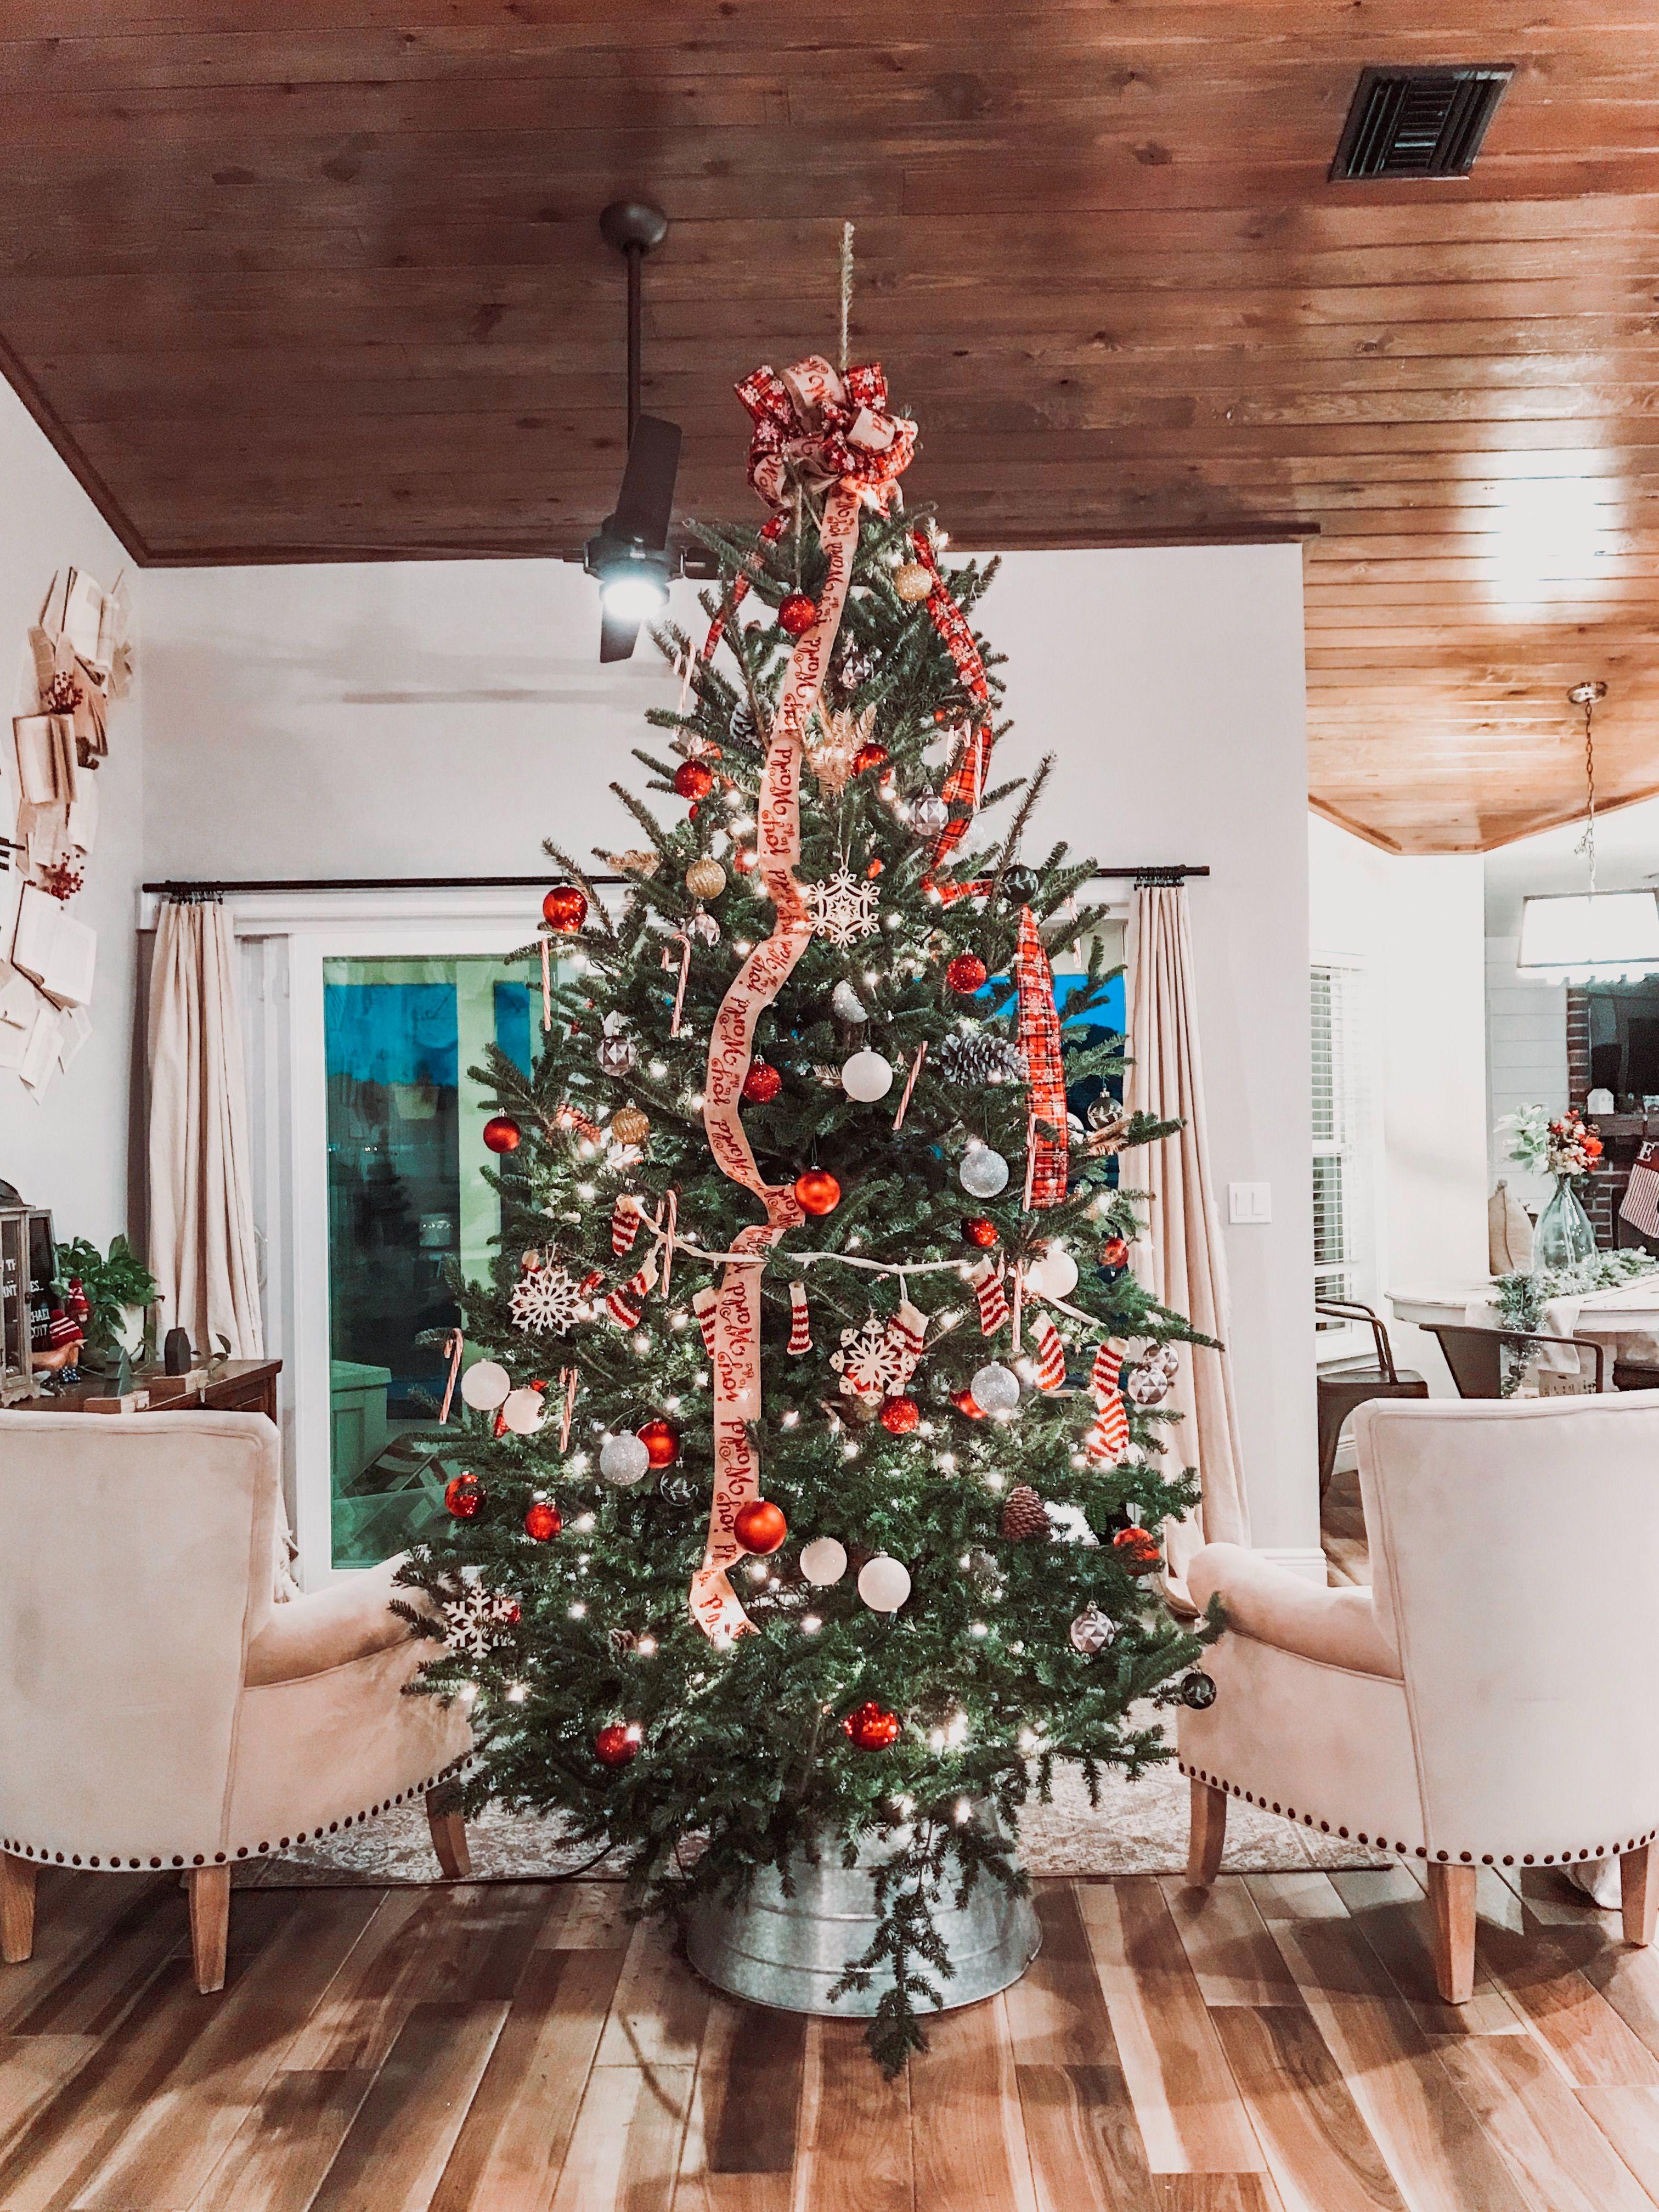 Emily Houseandhens Instagram Photos And Videos Christmas Inspo Christmas Decorations Holiday Decor